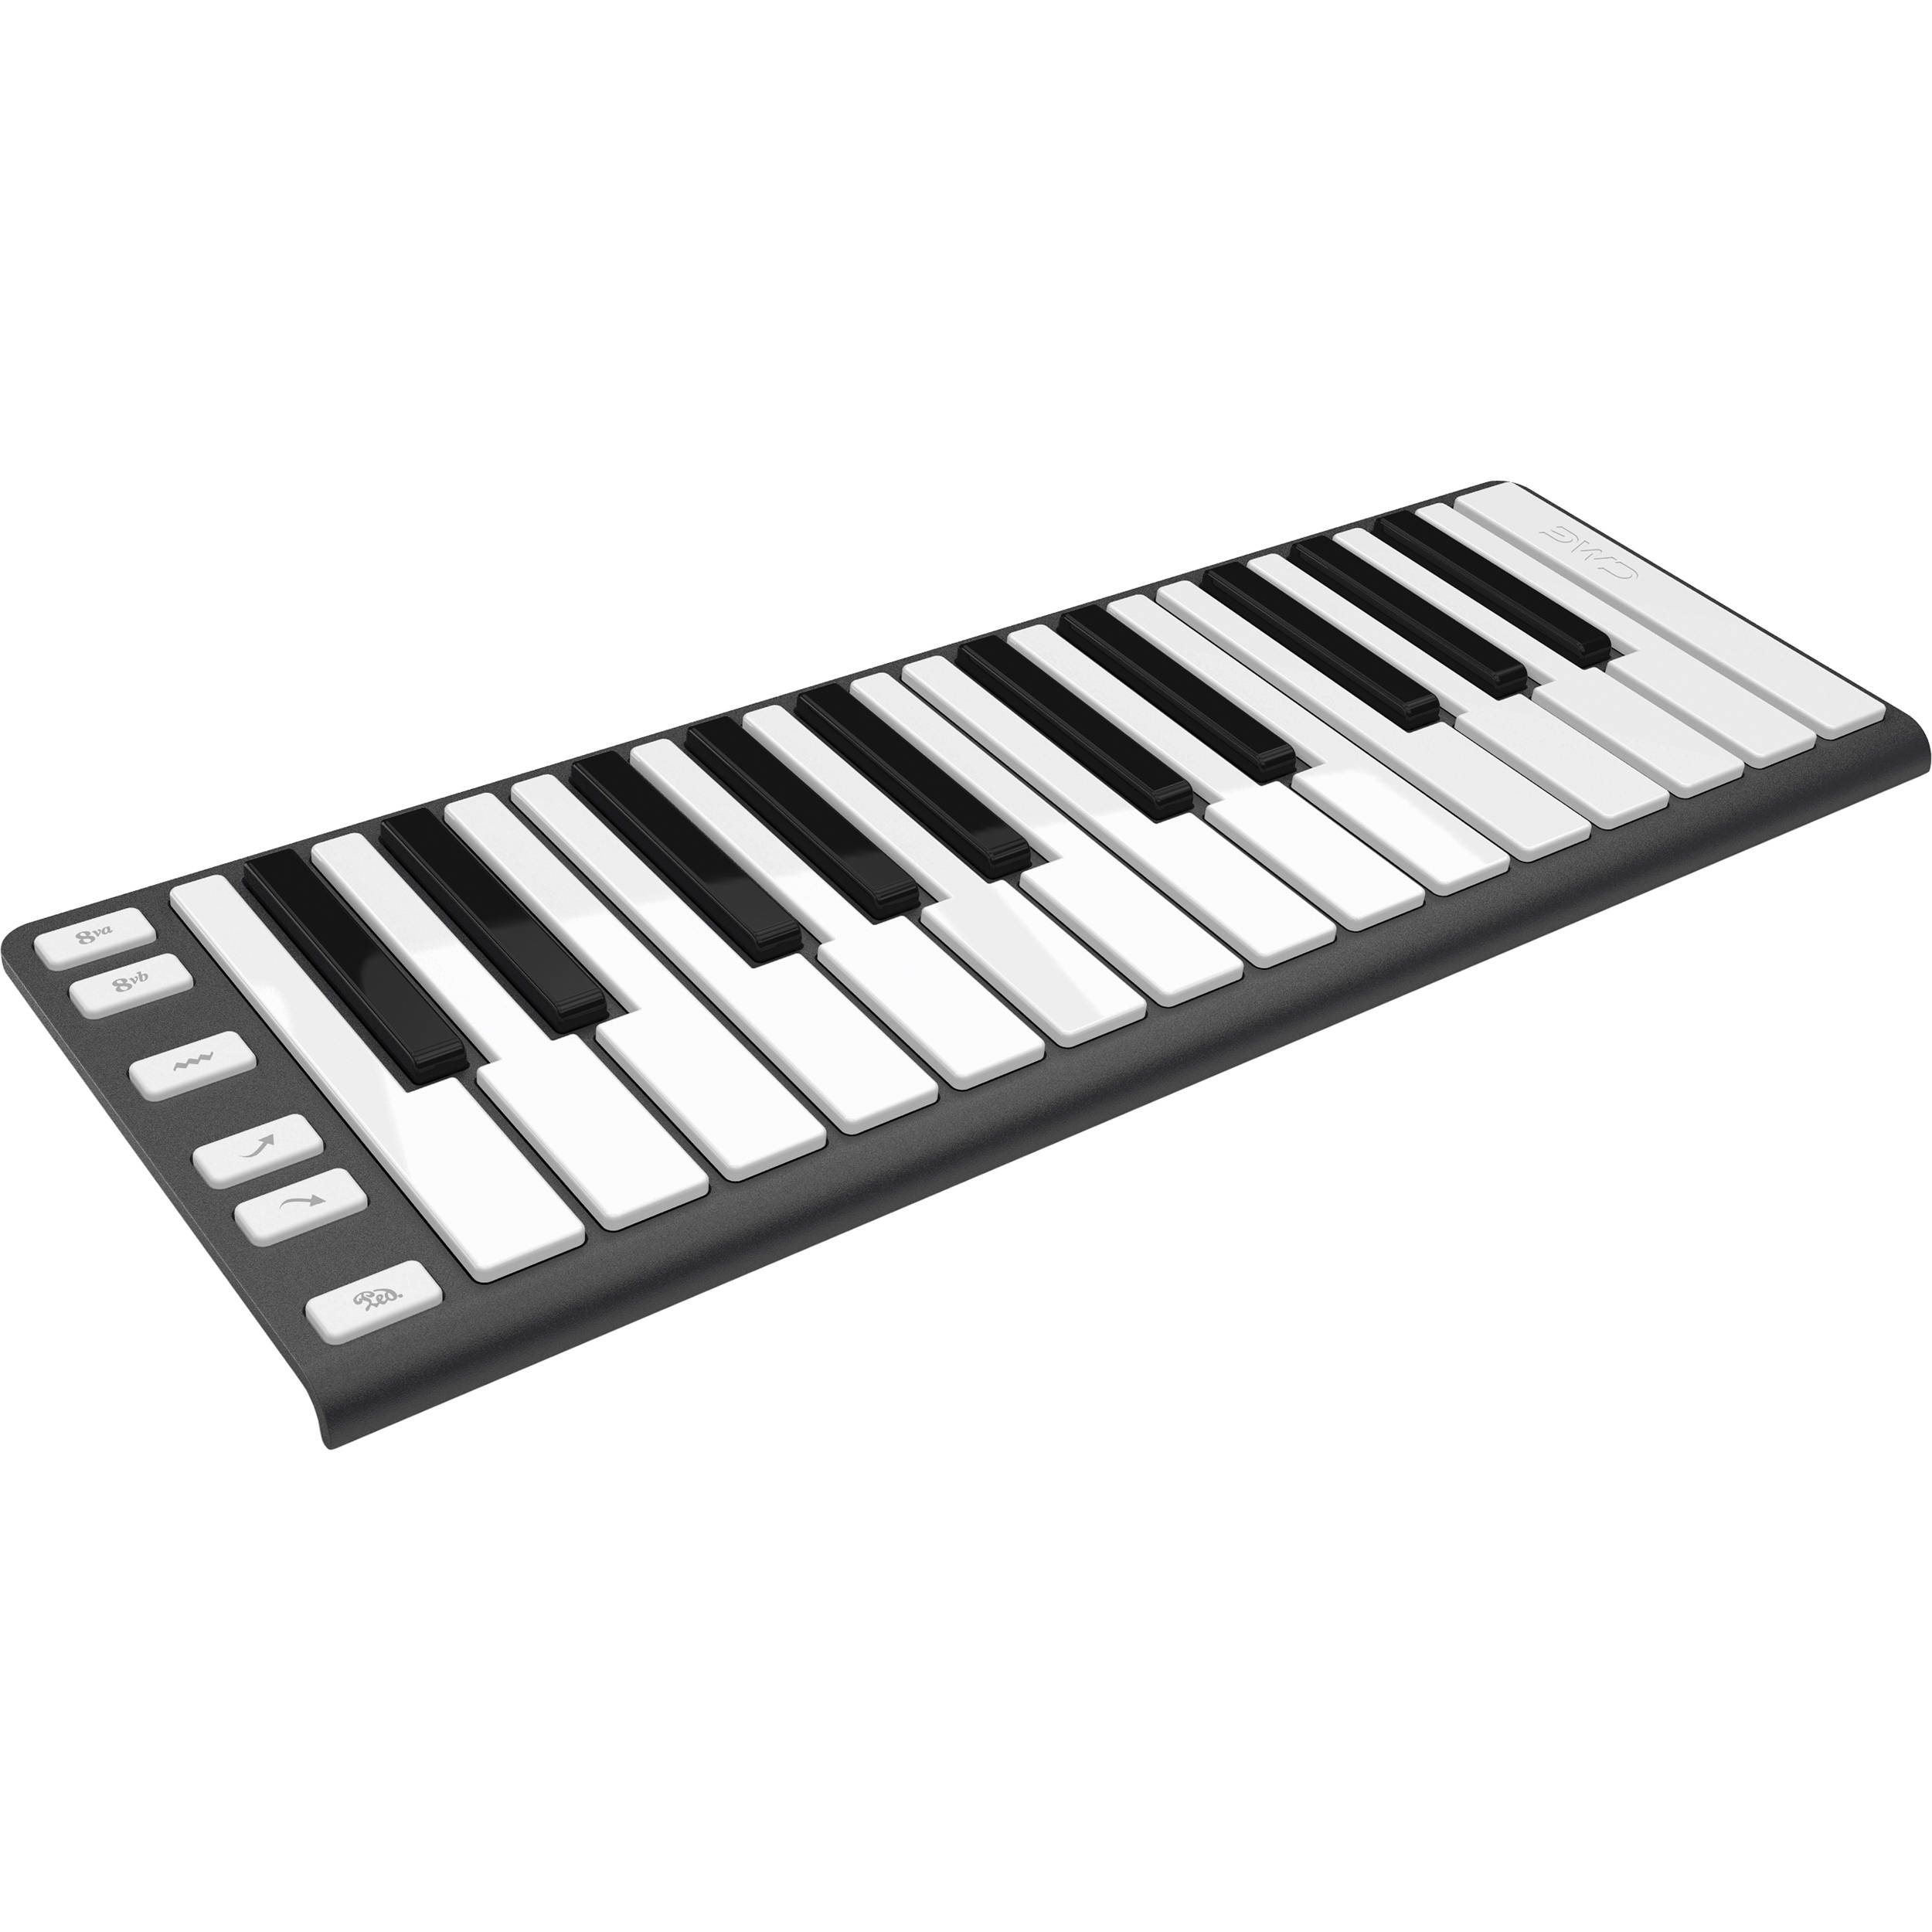 cme xkey mobile midi keyboard xkey gun metal gray b h photo. Black Bedroom Furniture Sets. Home Design Ideas